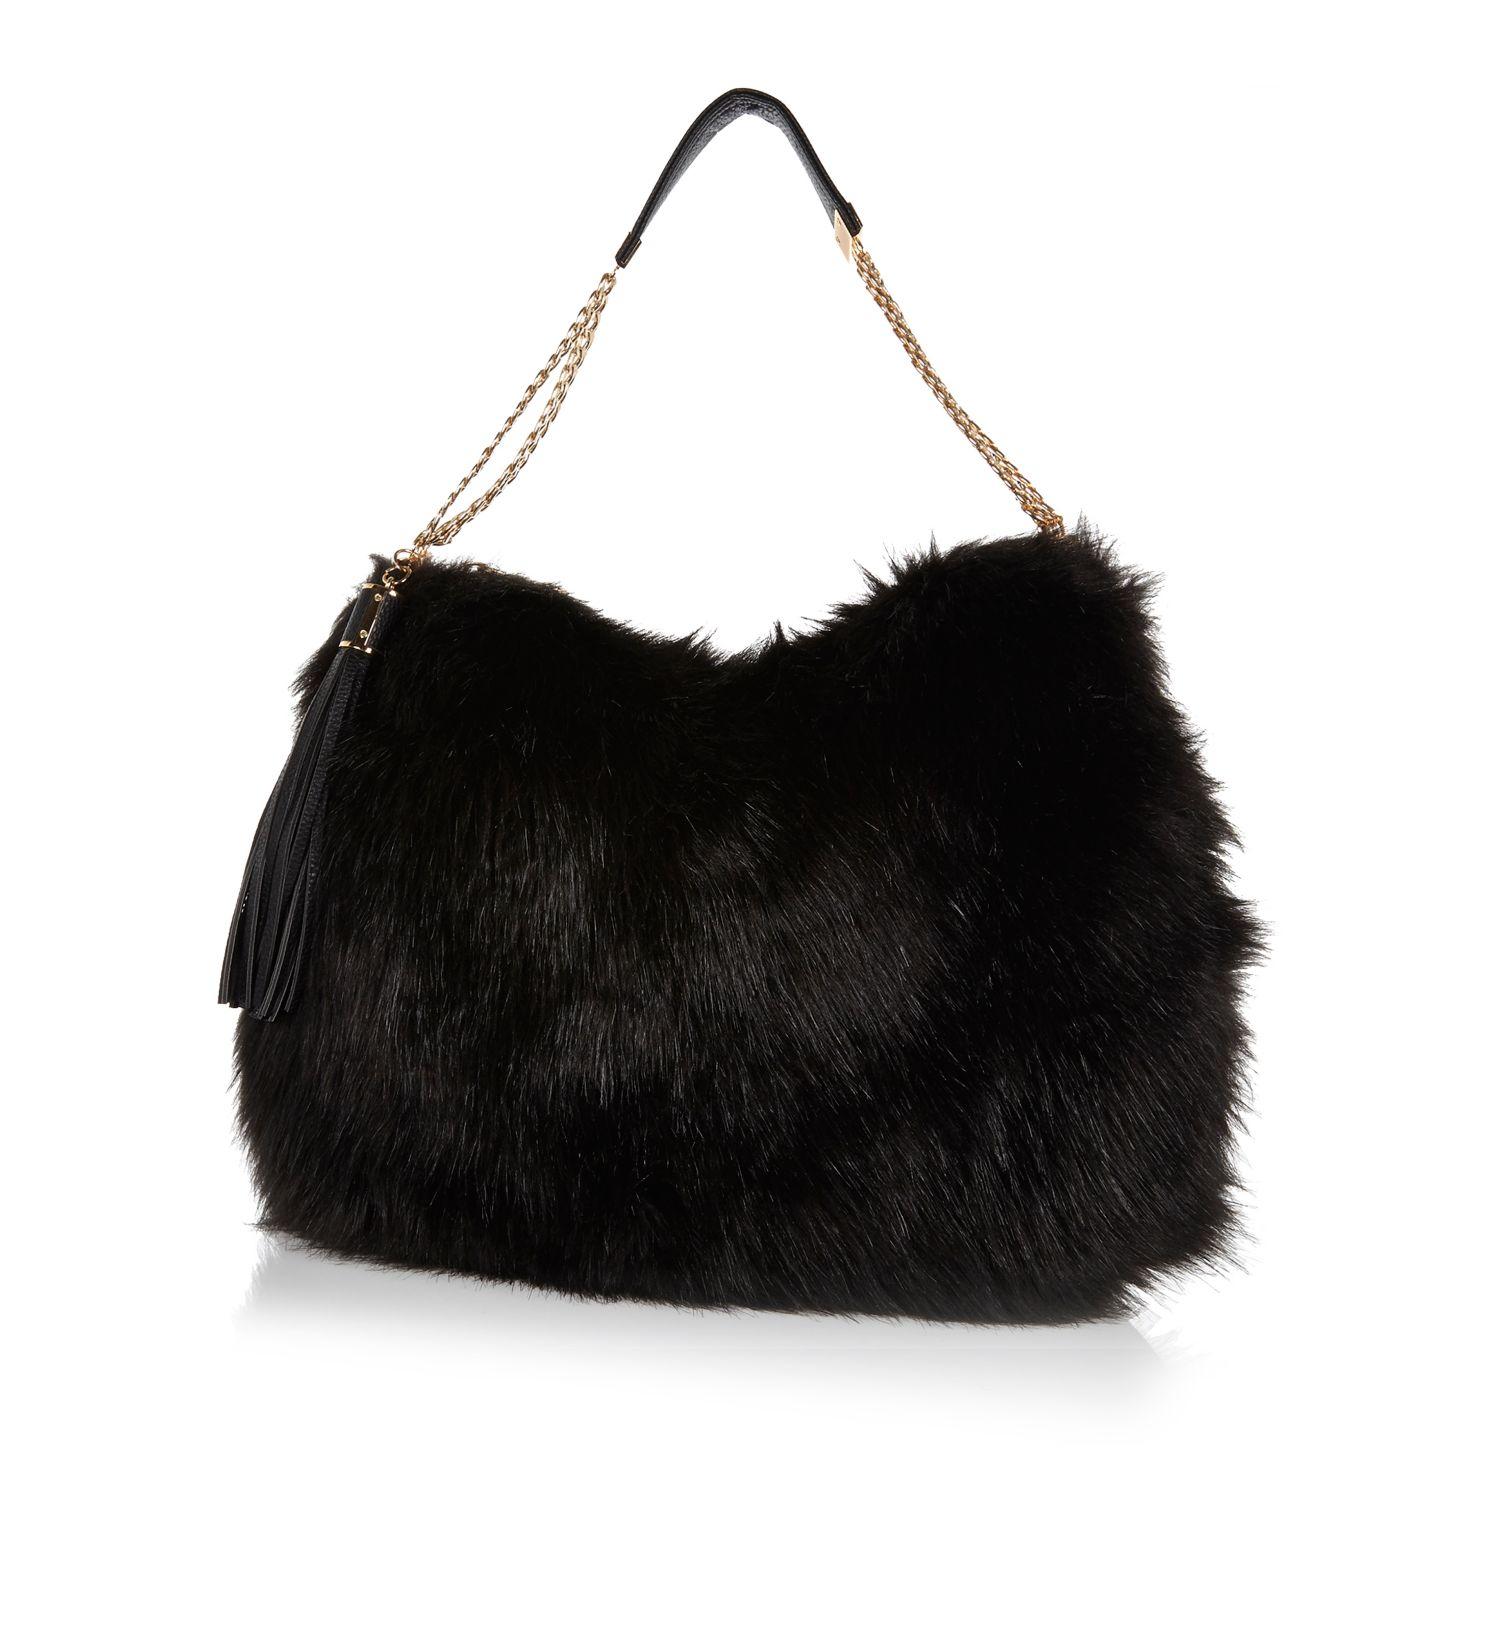 dfc1c2c28782 River Island Black Faux Fur Slouch Bag in Black - Lyst